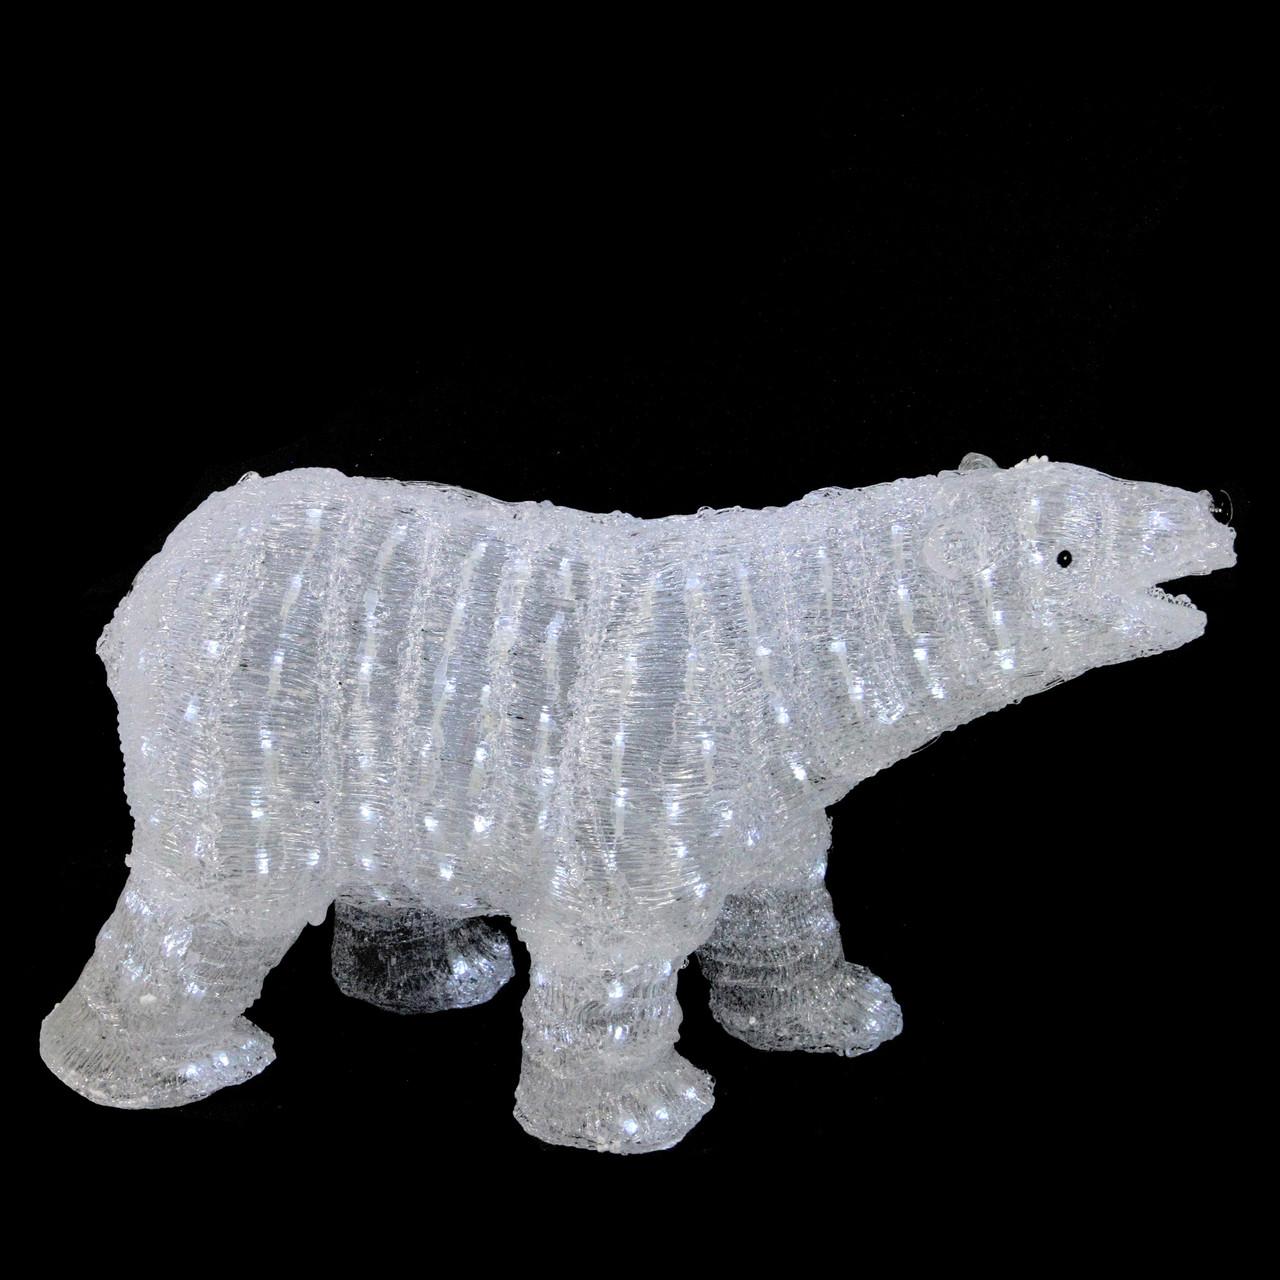 Large Acrylic Polar Bear White LED Lights Outdoor Christmas Display Decoration